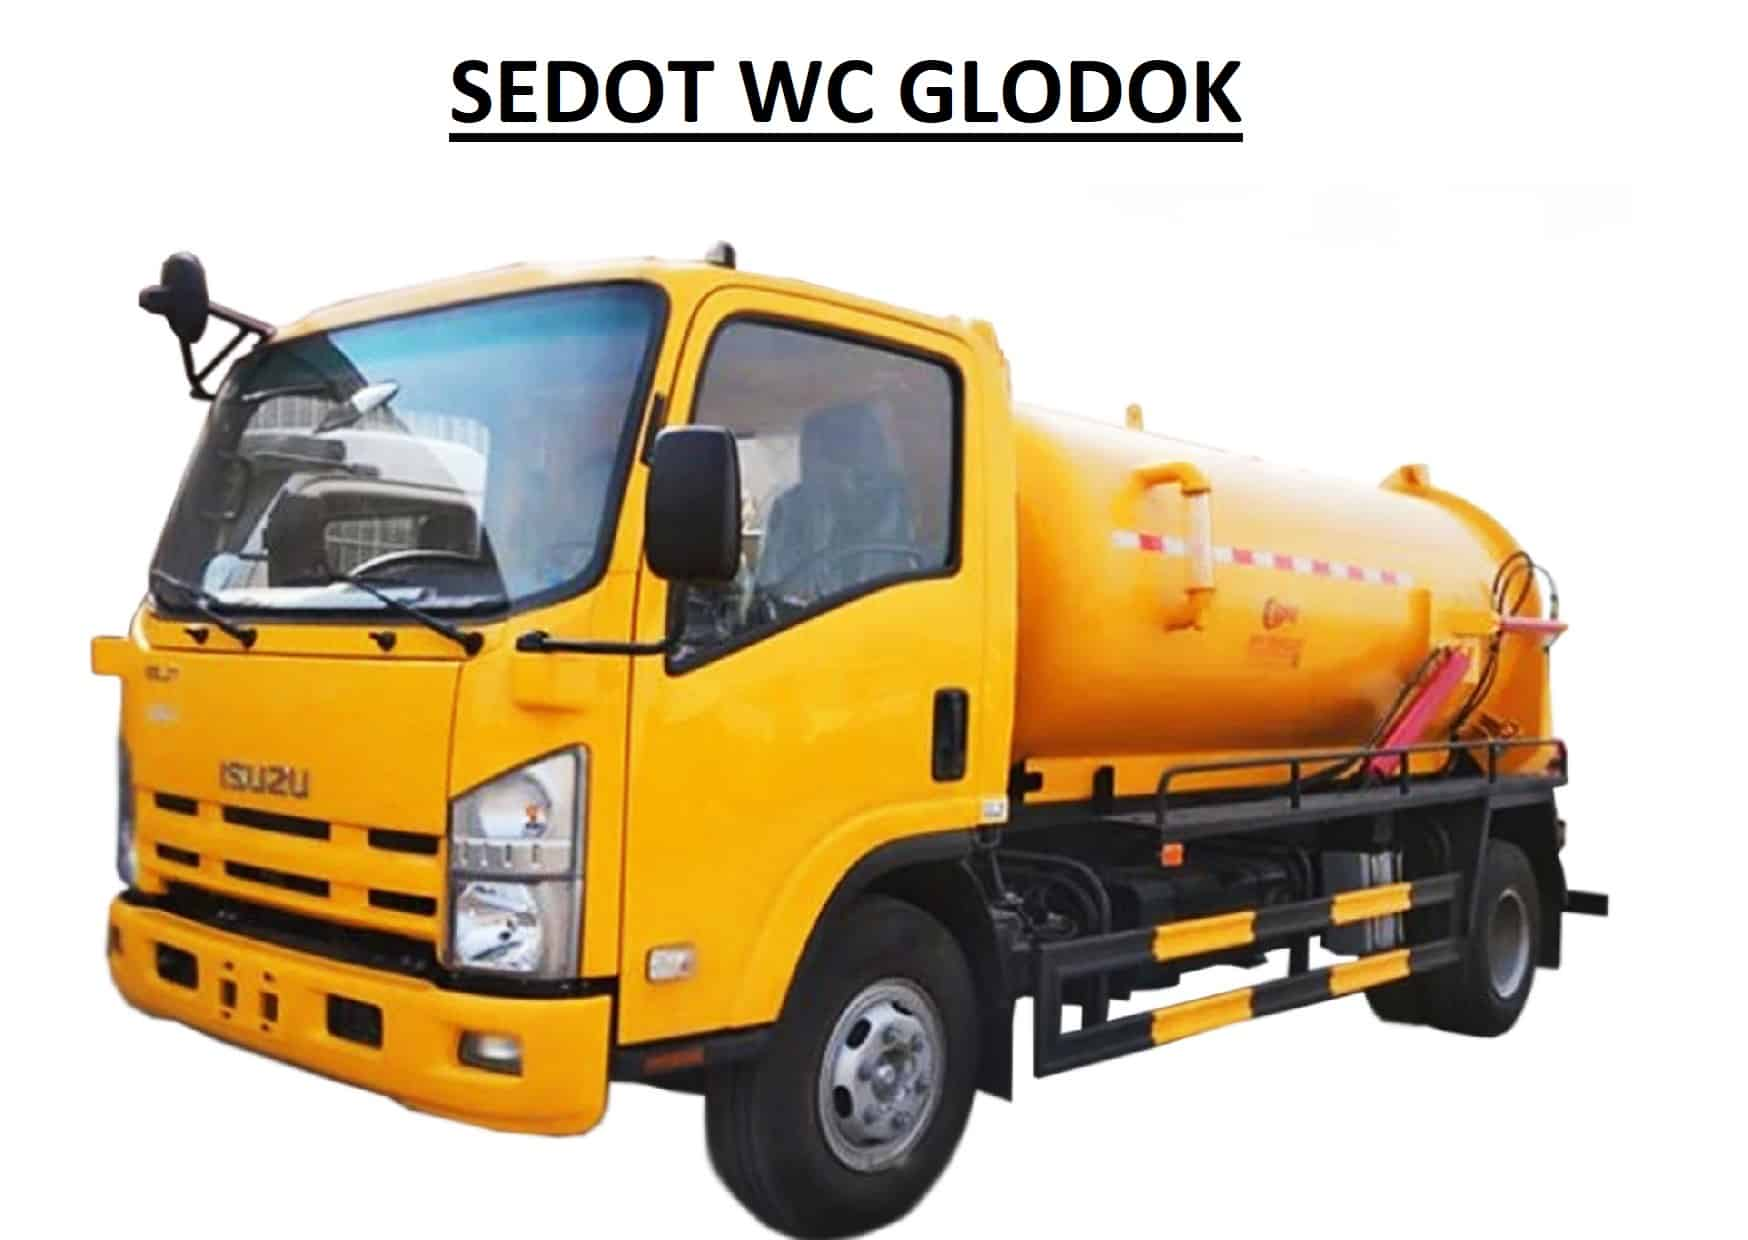 Sedot Wc Glodok